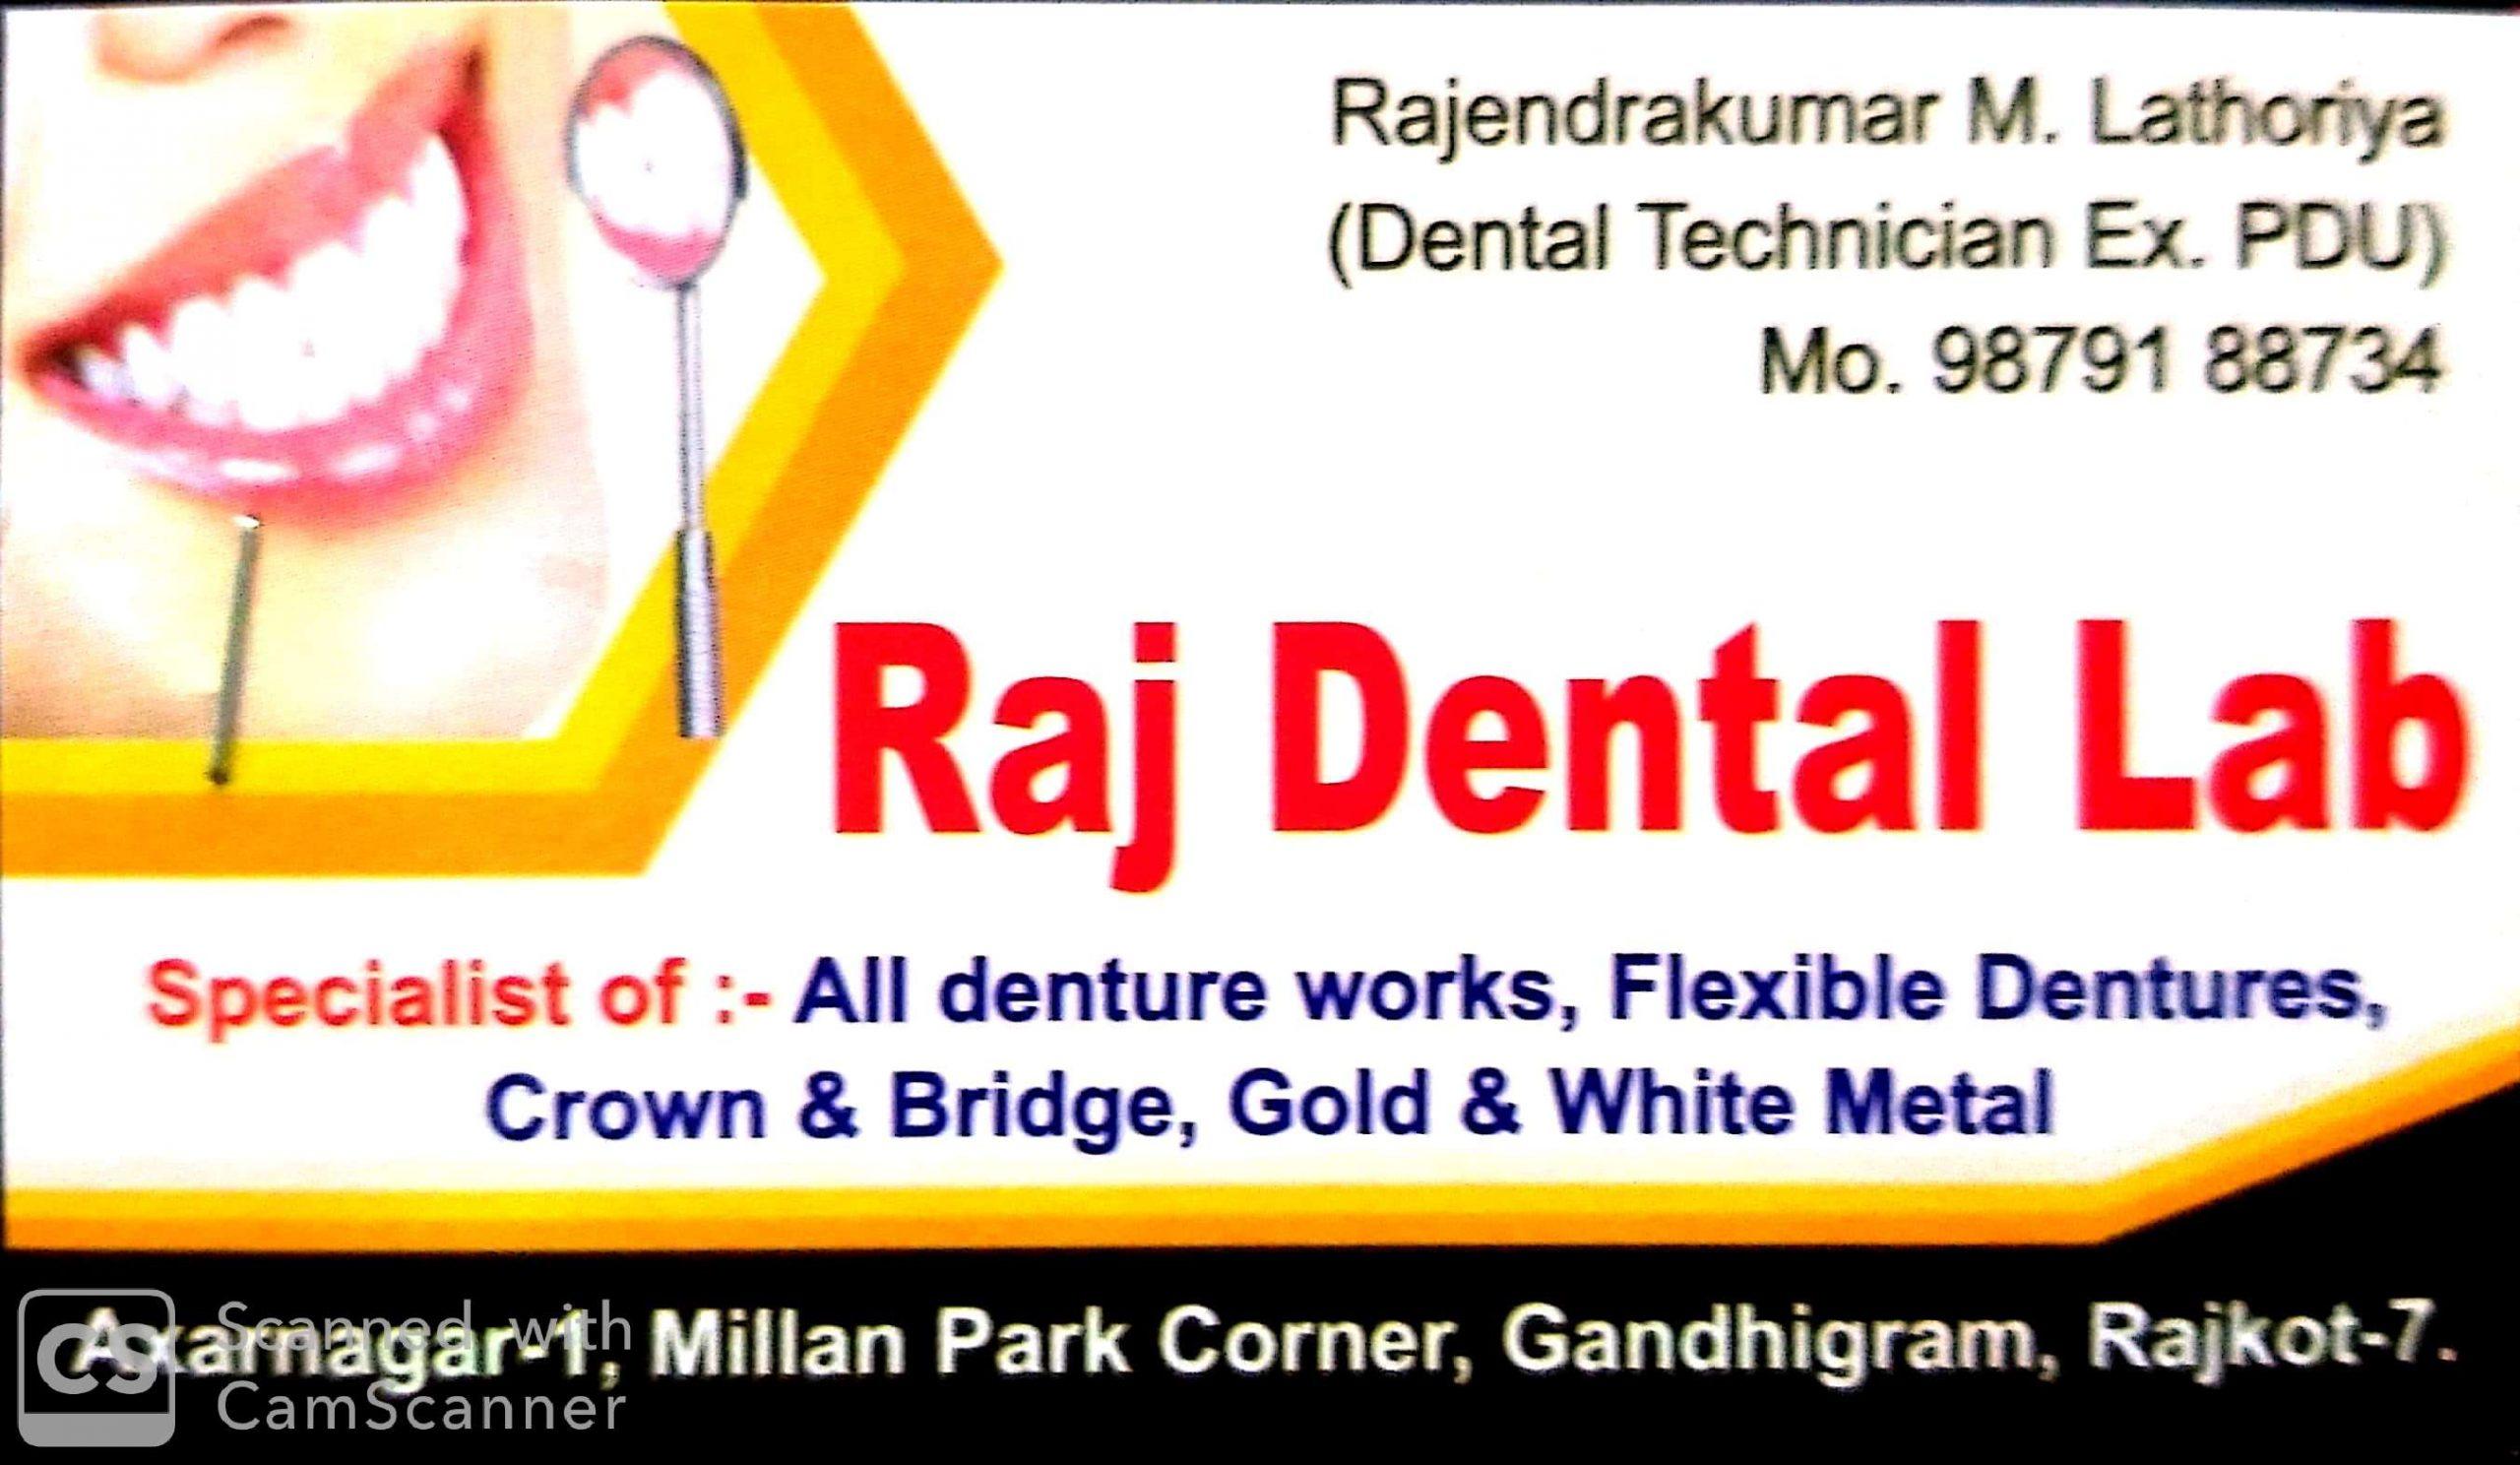 Raj Dental Lab